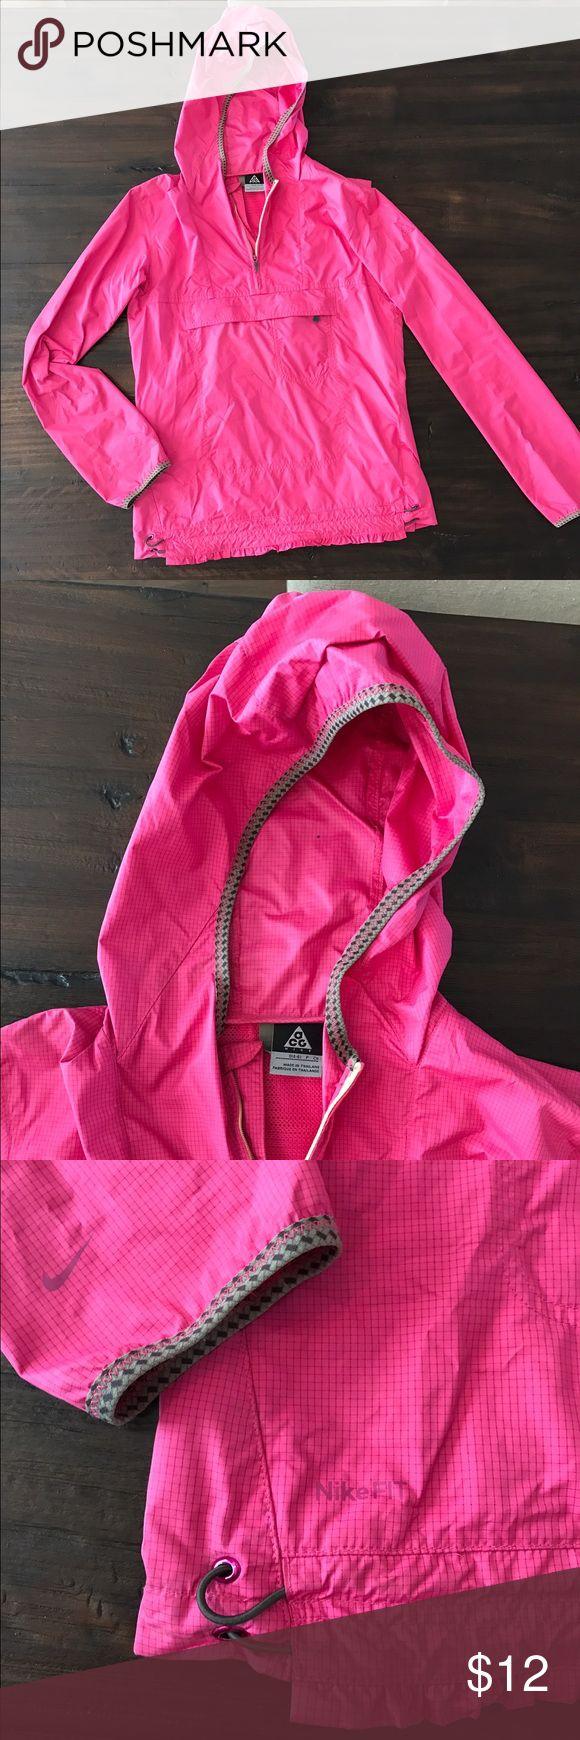 Nike Pink Waterproof Jacket Good used condition, waterproof nike pullover jacket. Cute pink ruffles on the hem. Nike Jackets & Coats Utility Jackets